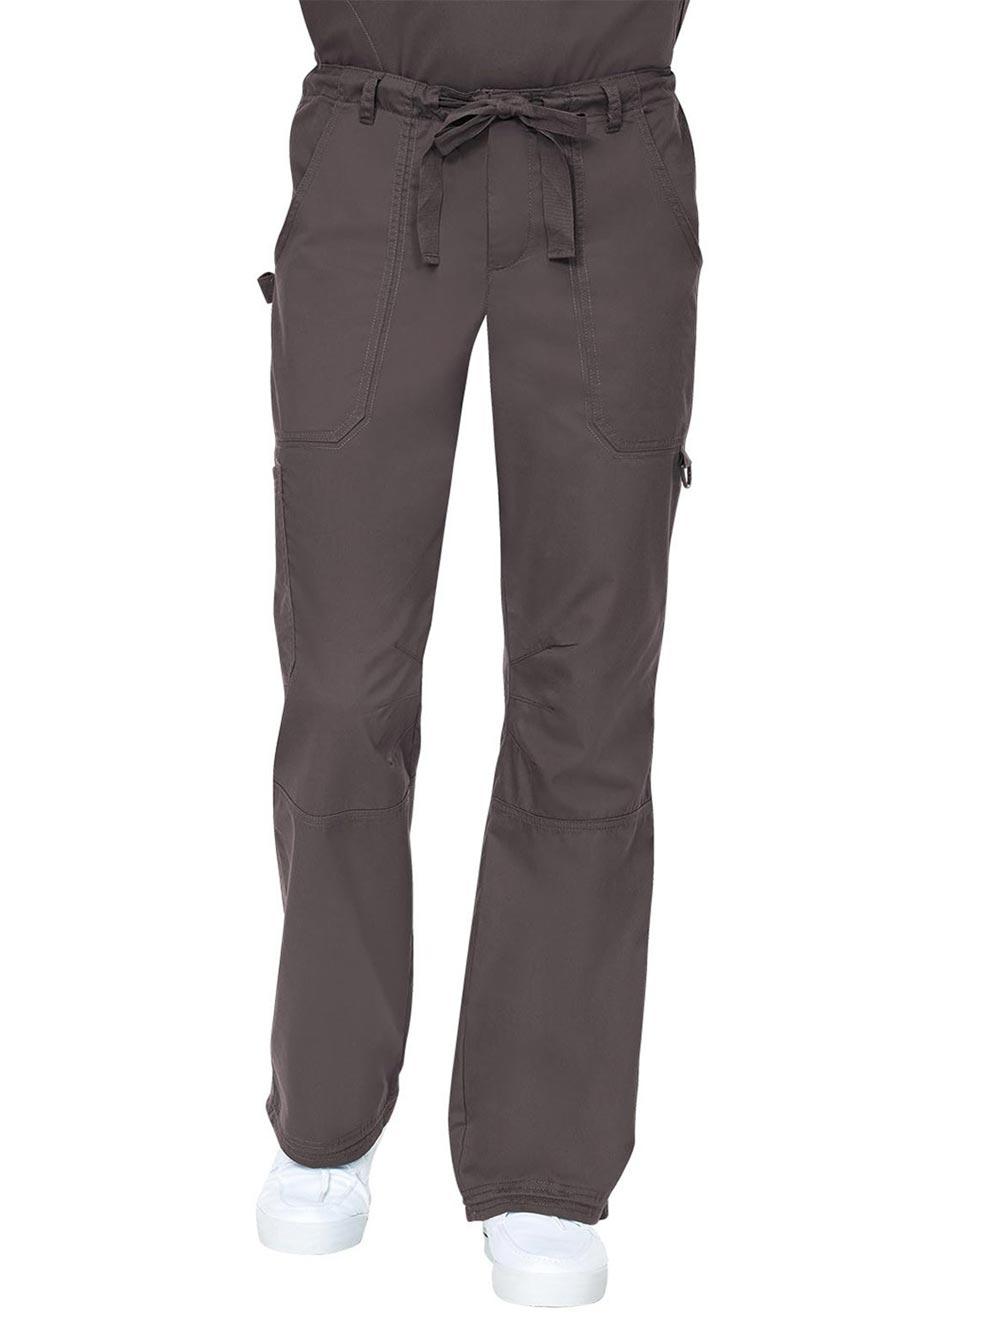 'James' Drawstring Pants